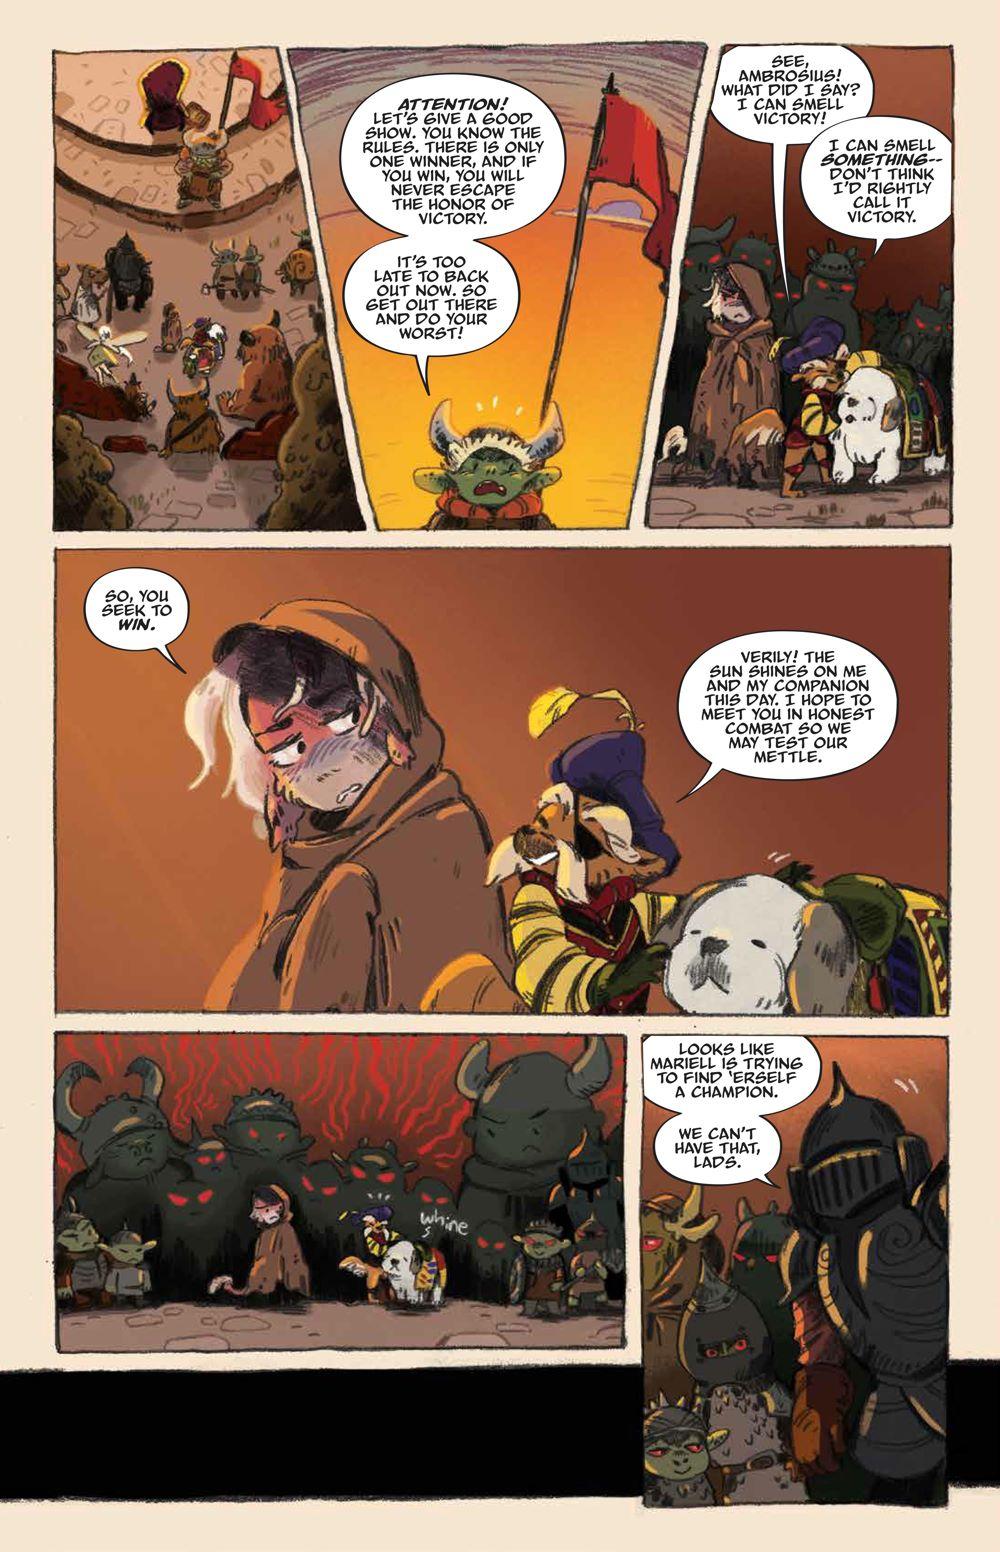 Labyrinth_UnderSpell_HC_PRESS_14 ComicList Previews: JIM HENSON'S LABYRINTH UNDER THE SPELL HC